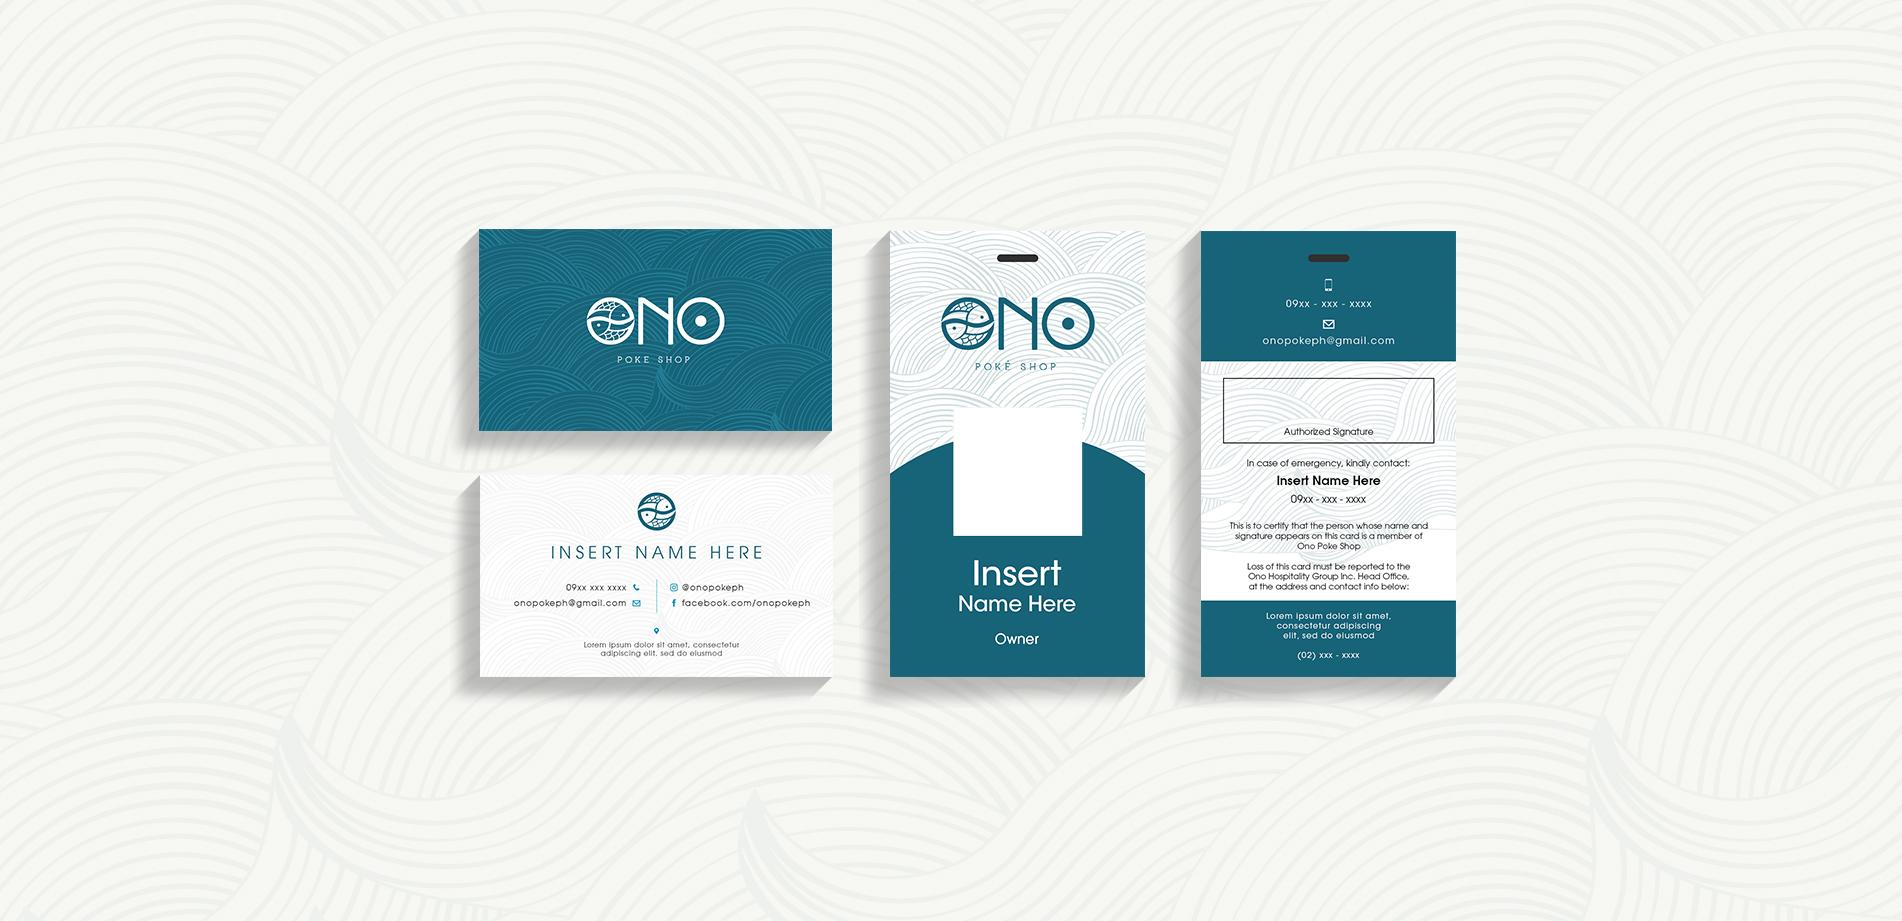 Ono-Branding_Slide-3